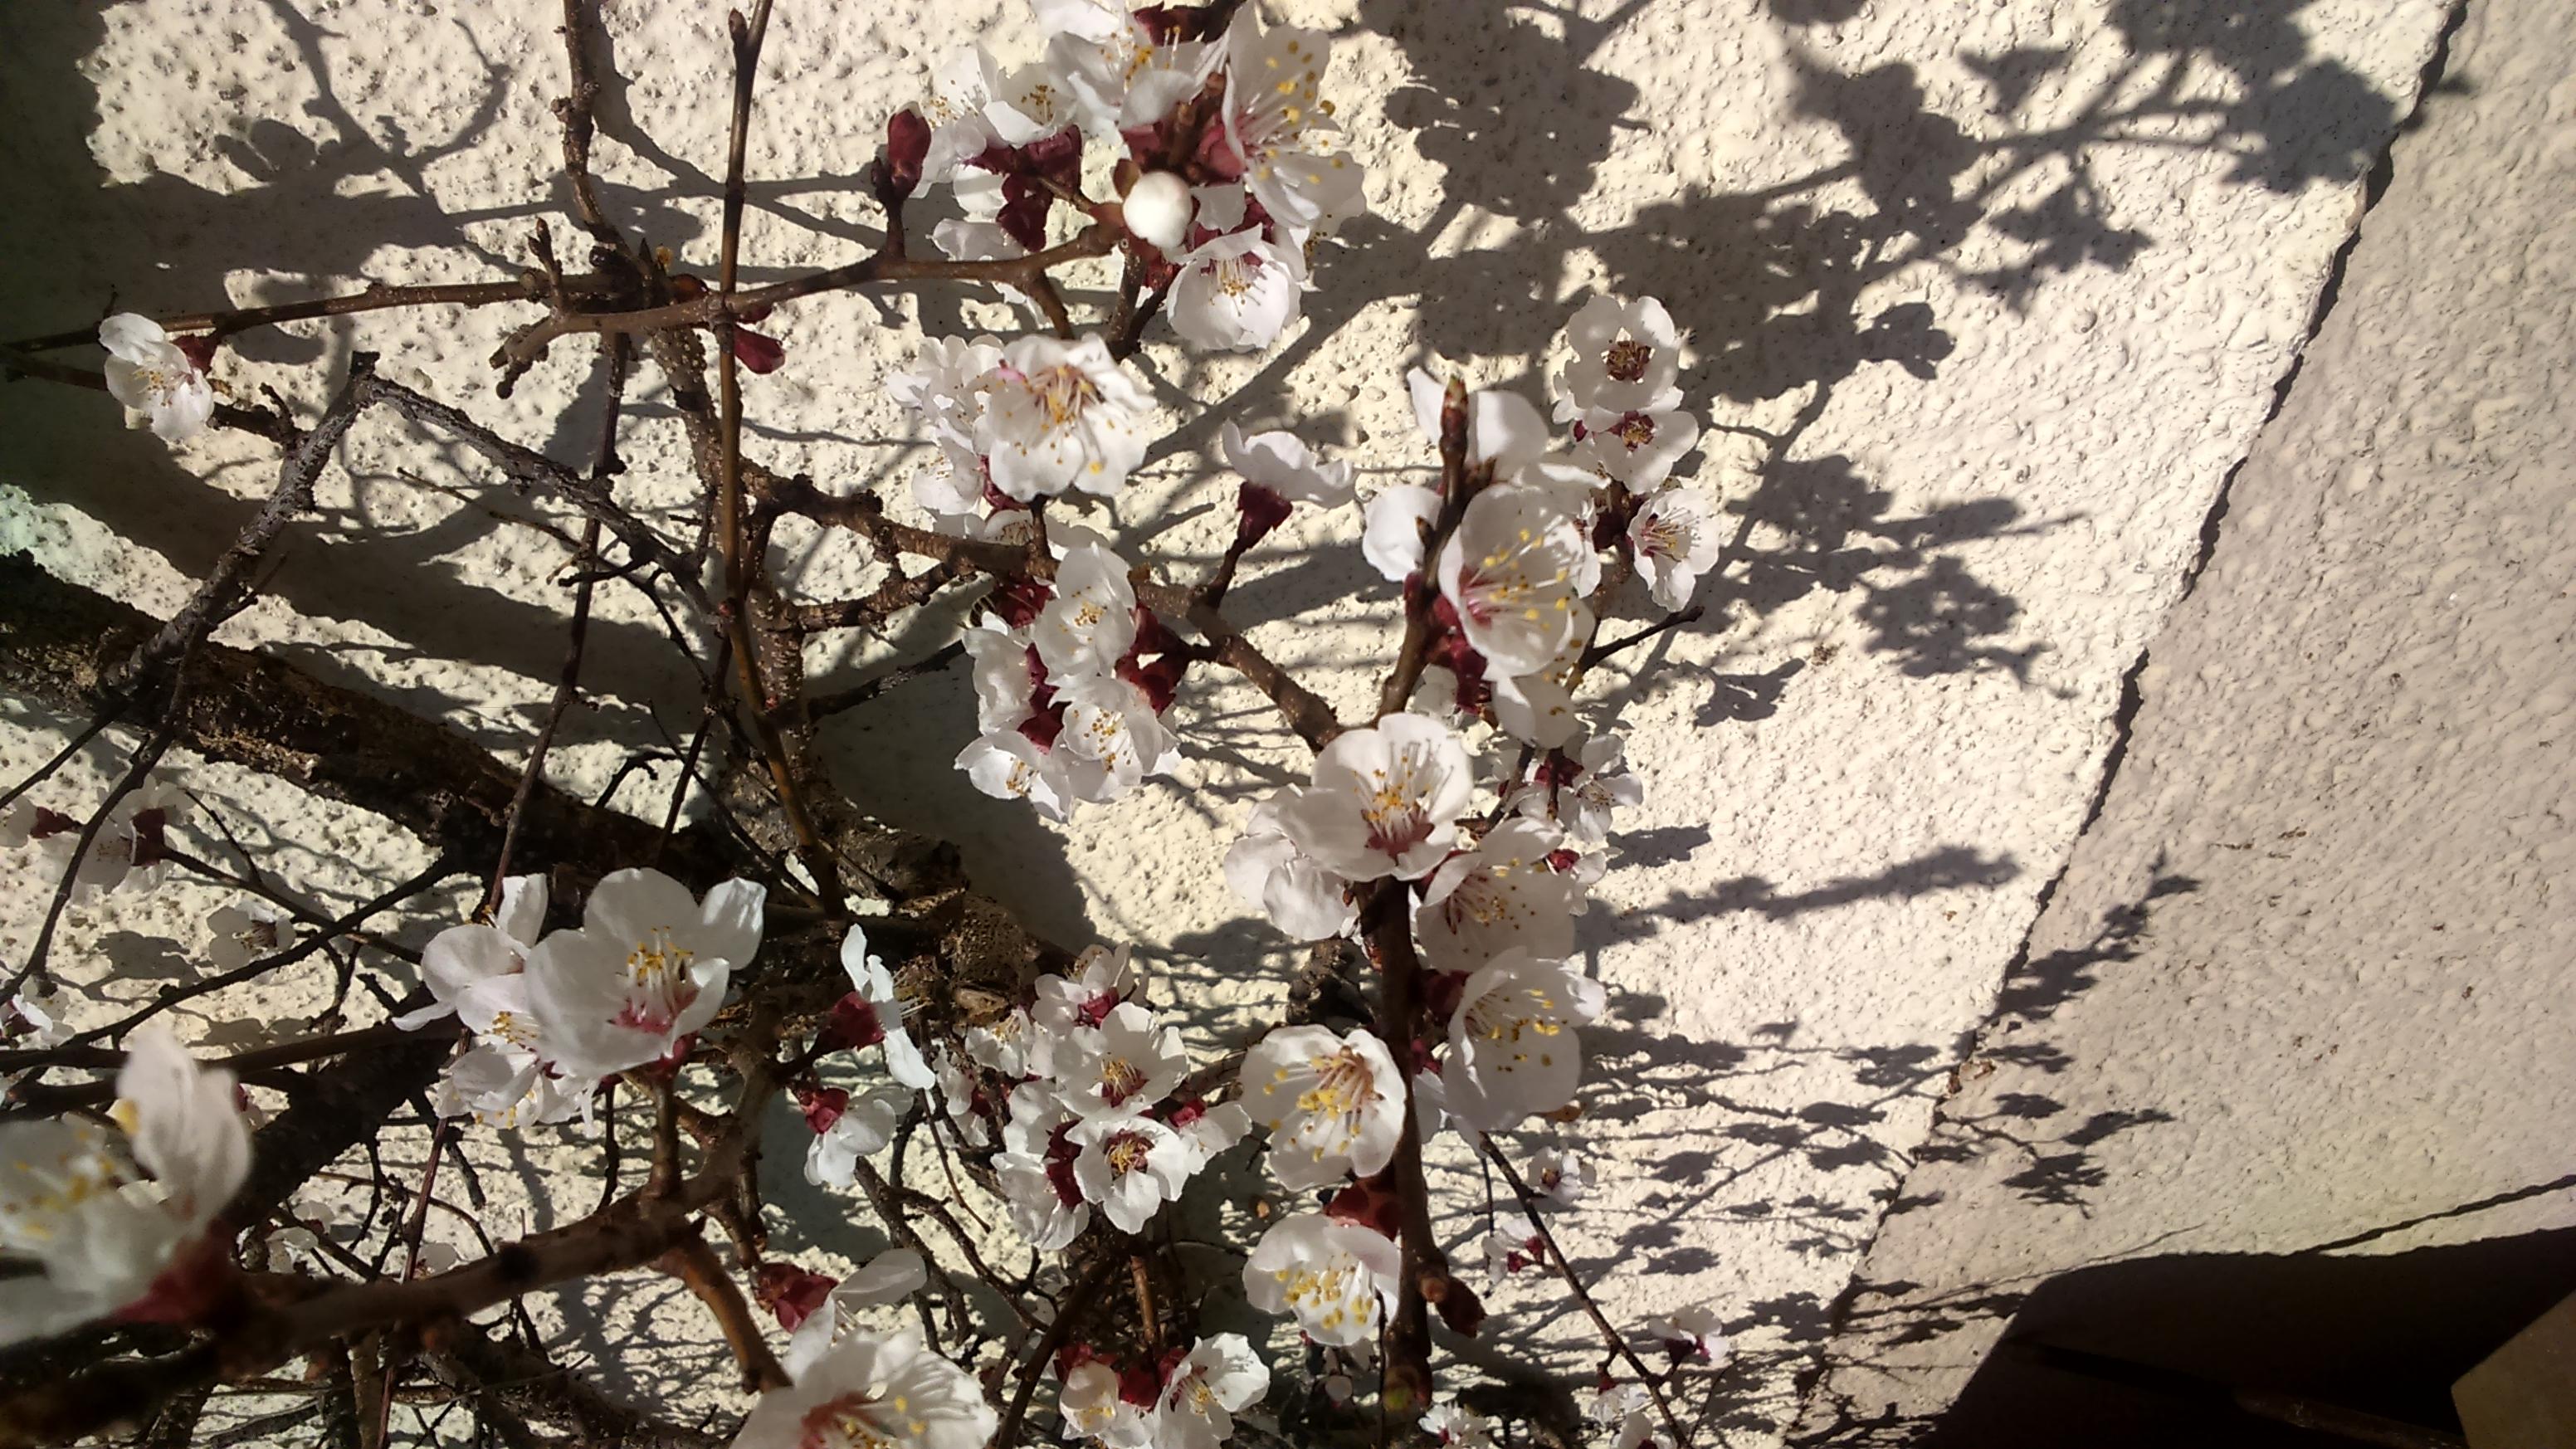 Frühlingsgefühle Wecken - Gu Gartenarbeit Fruhling Fruhlingsbeginn Tipps